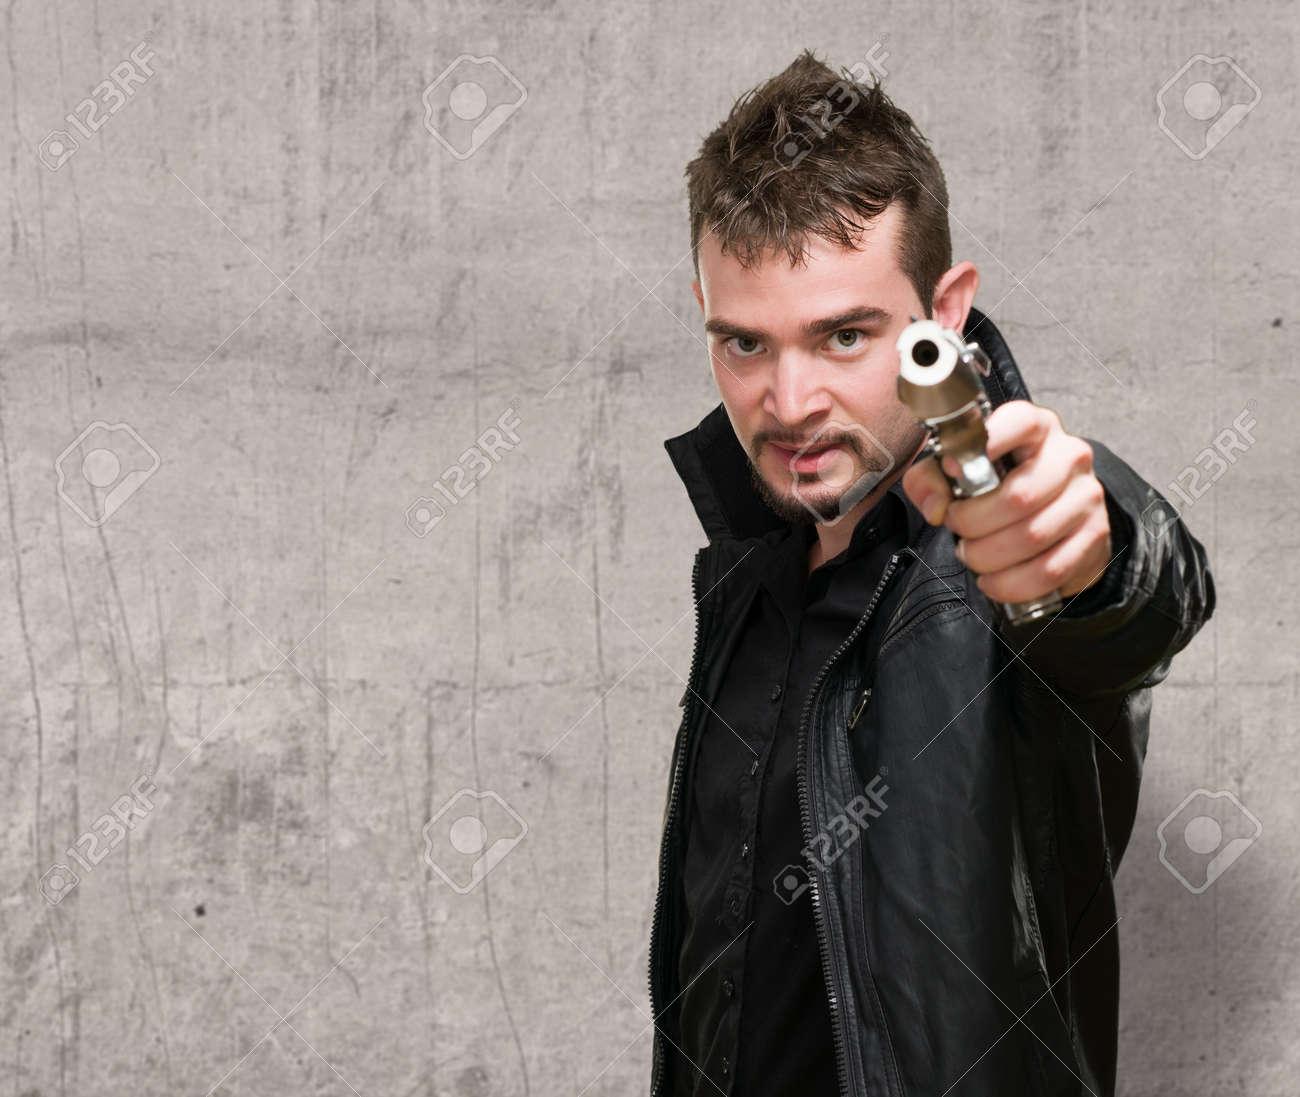 Man Holding Gun Down Portrait of a Man Holding Gun